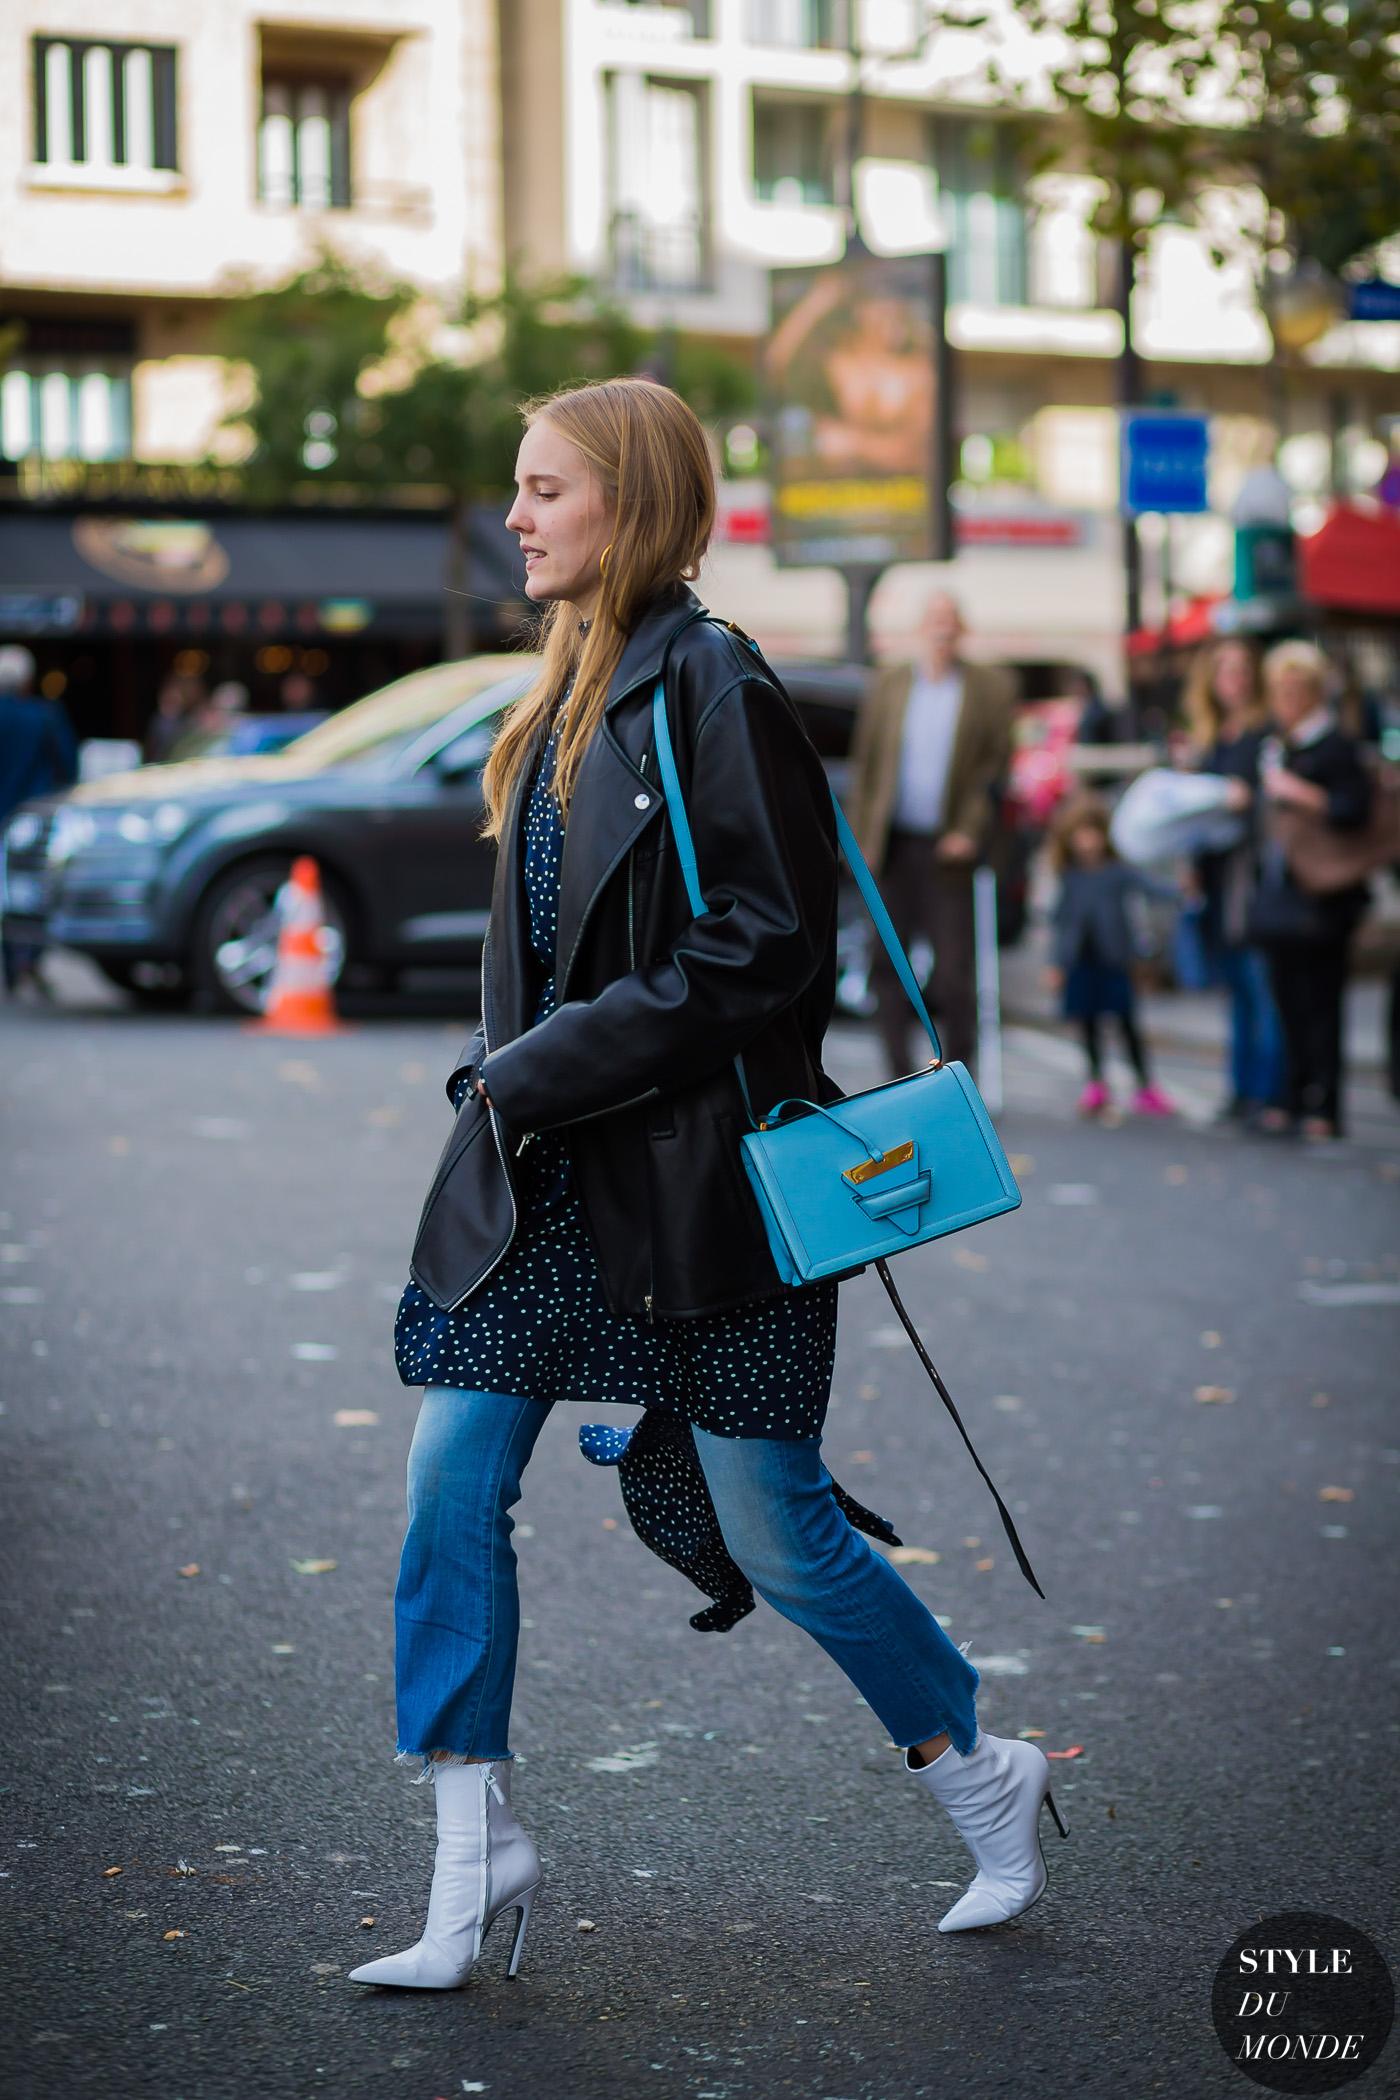 alexandra-carl-by-styledumonde-street-style-fashion-photography0e2a7010-700x10502x